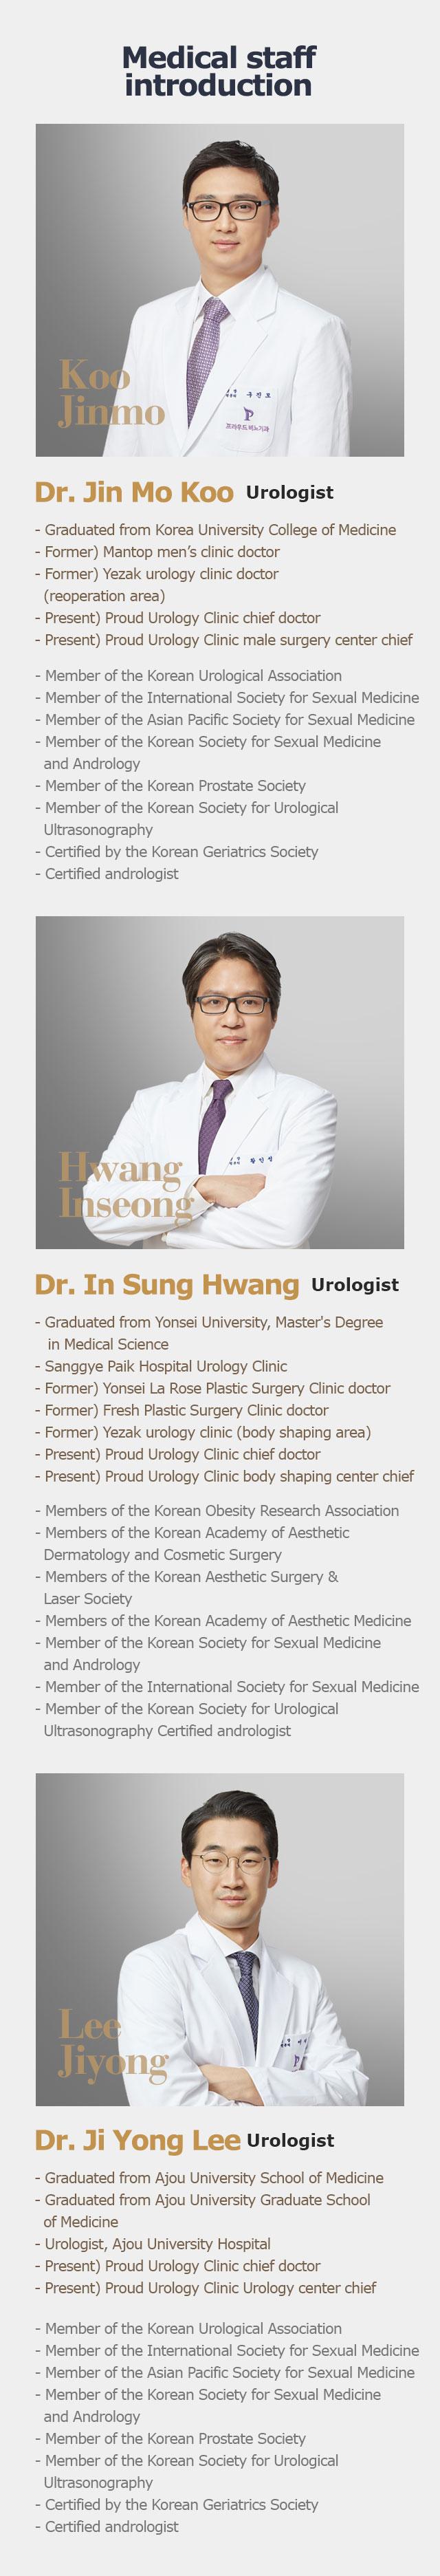 Proud Urology Clinic